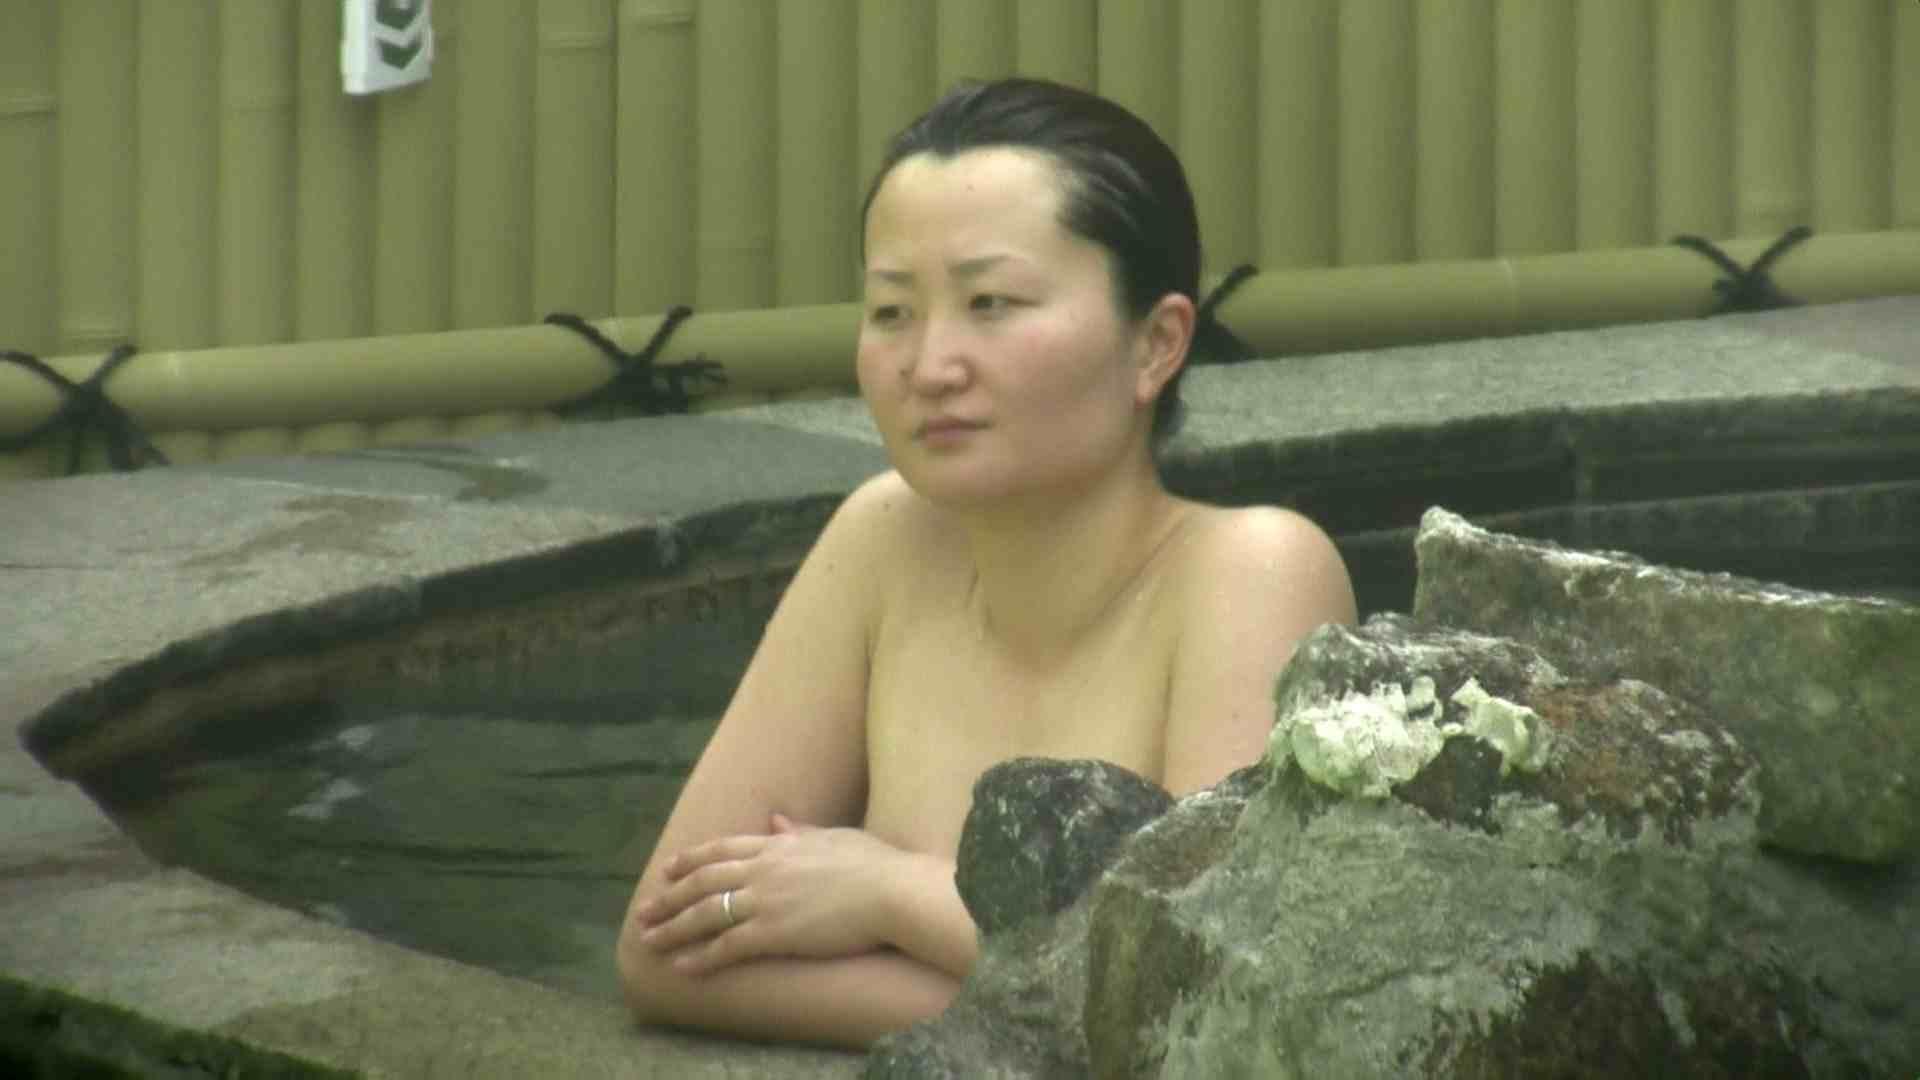 Aquaな露天風呂Vol.632 盗撮シリーズ | 露天風呂編  100PIX 7